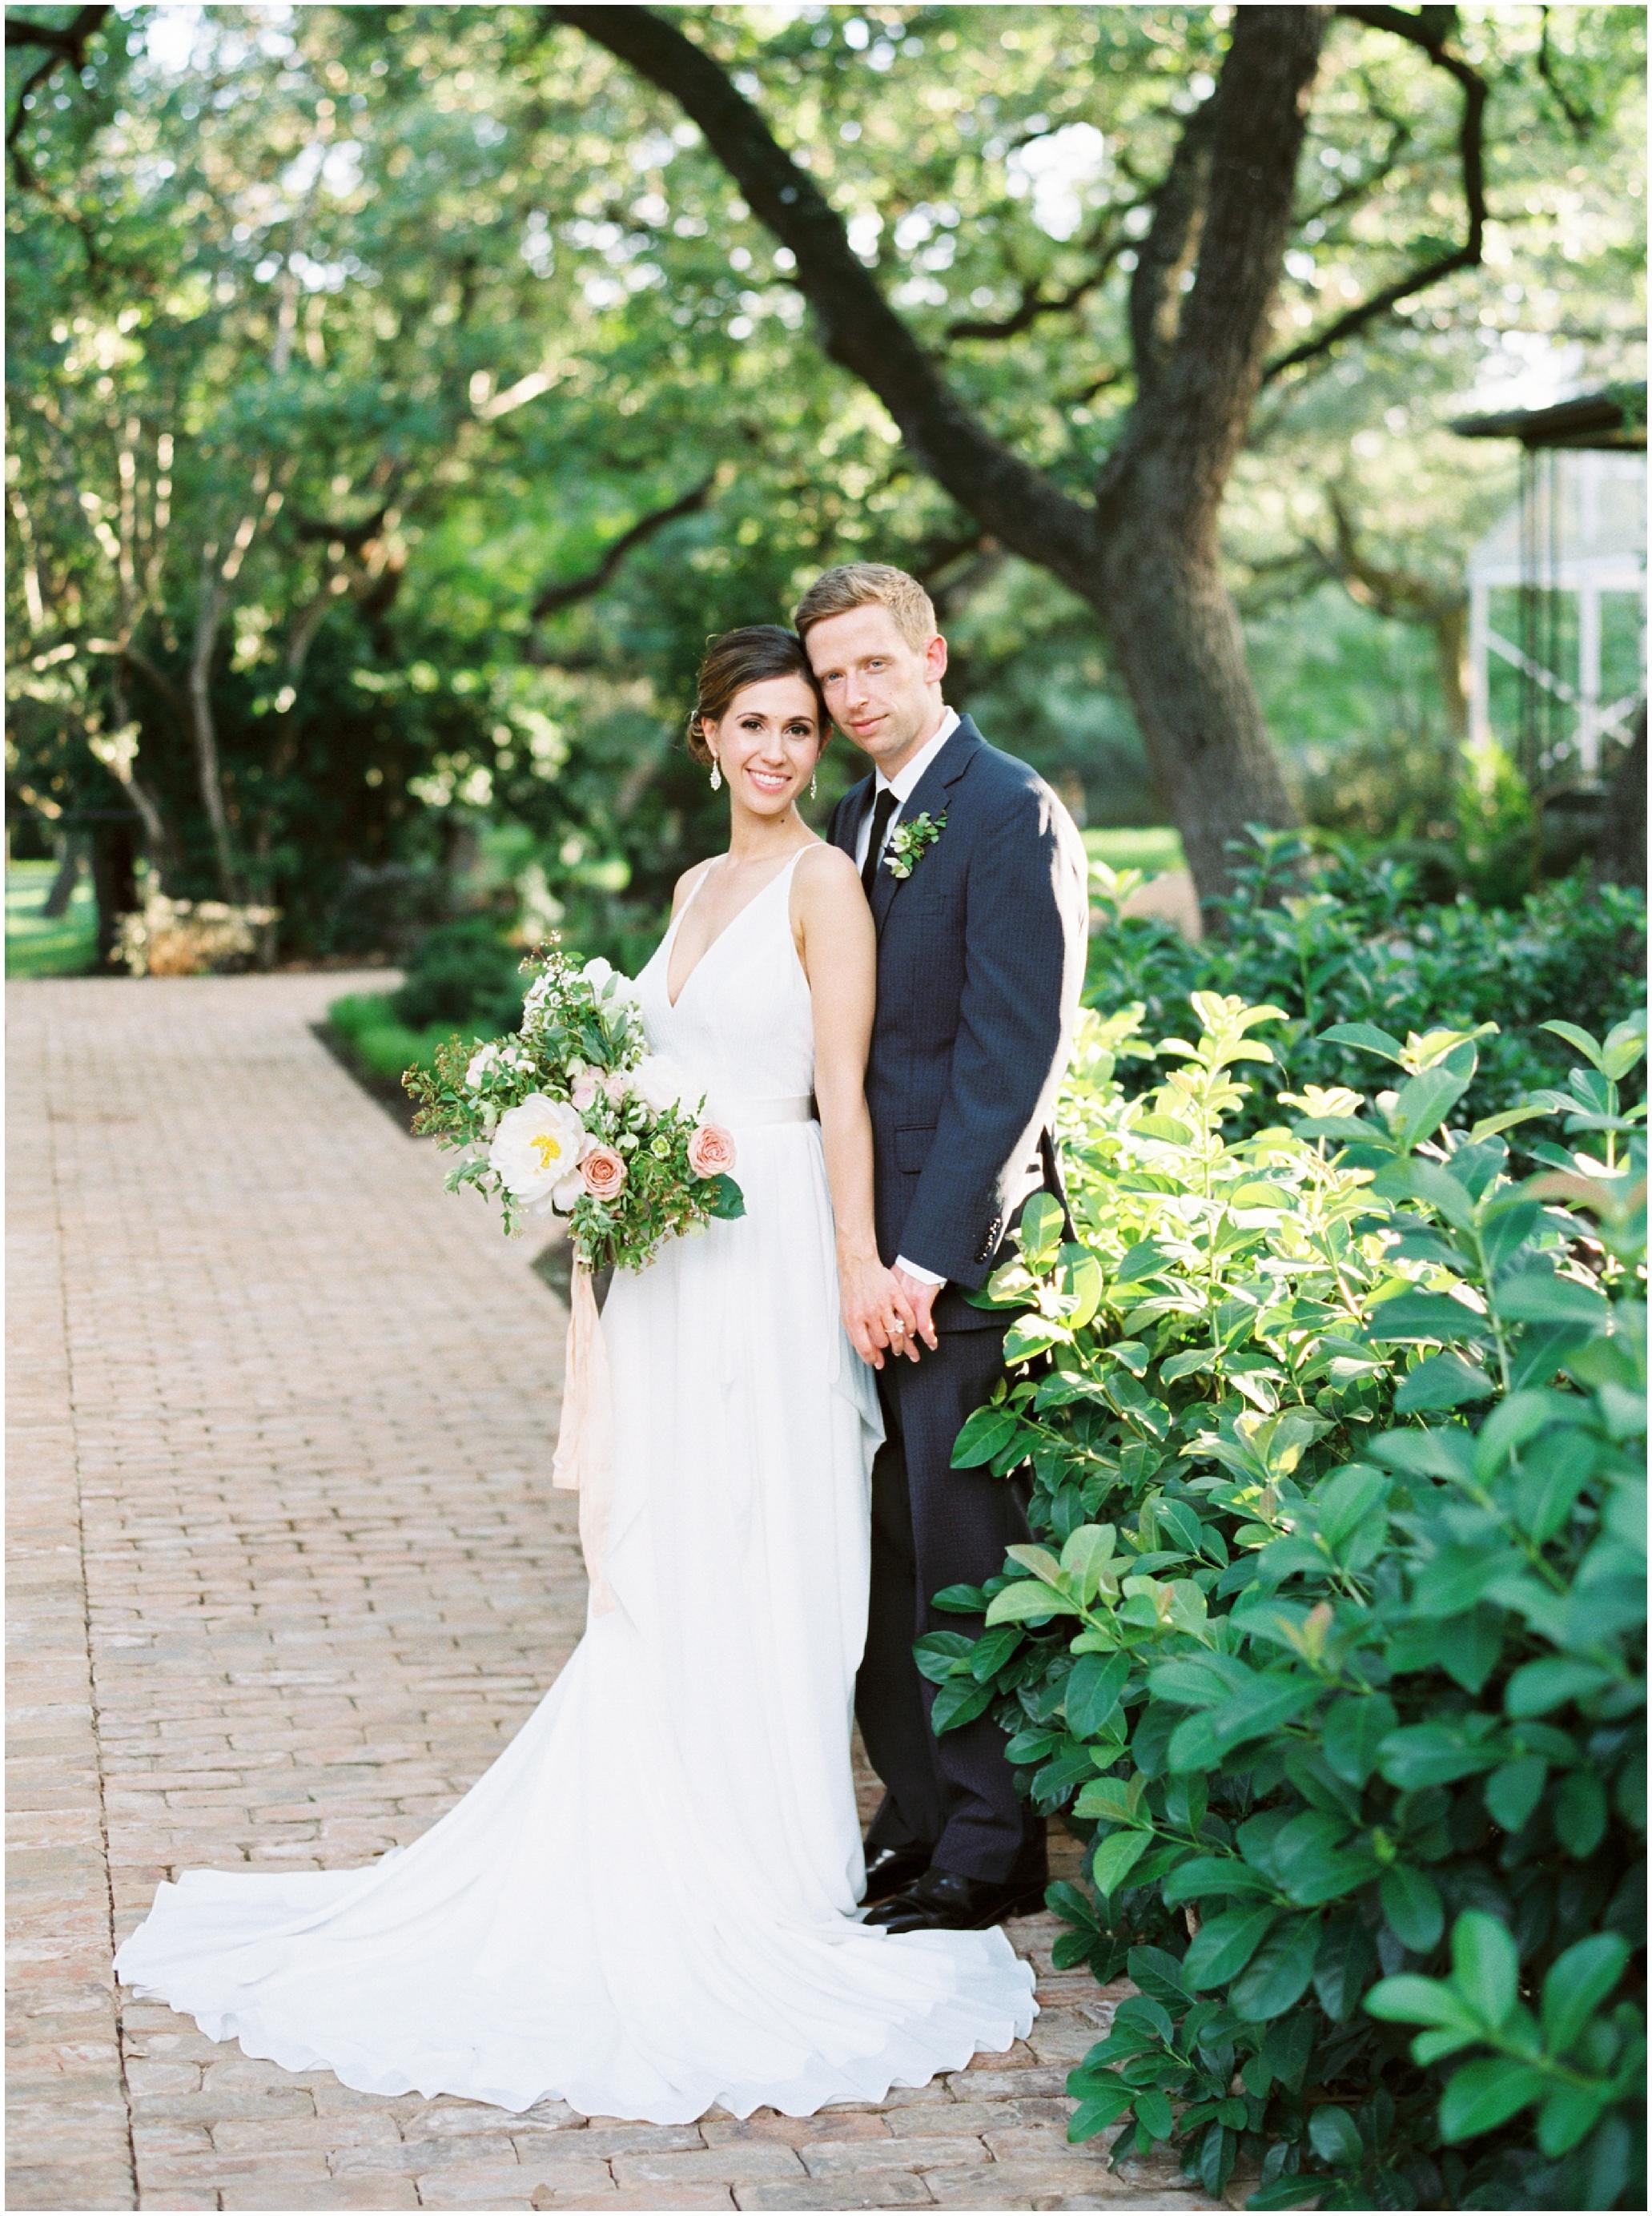 San Antonio Wedding Photographer, Film Photographer, Lost Mission_0119.jpg